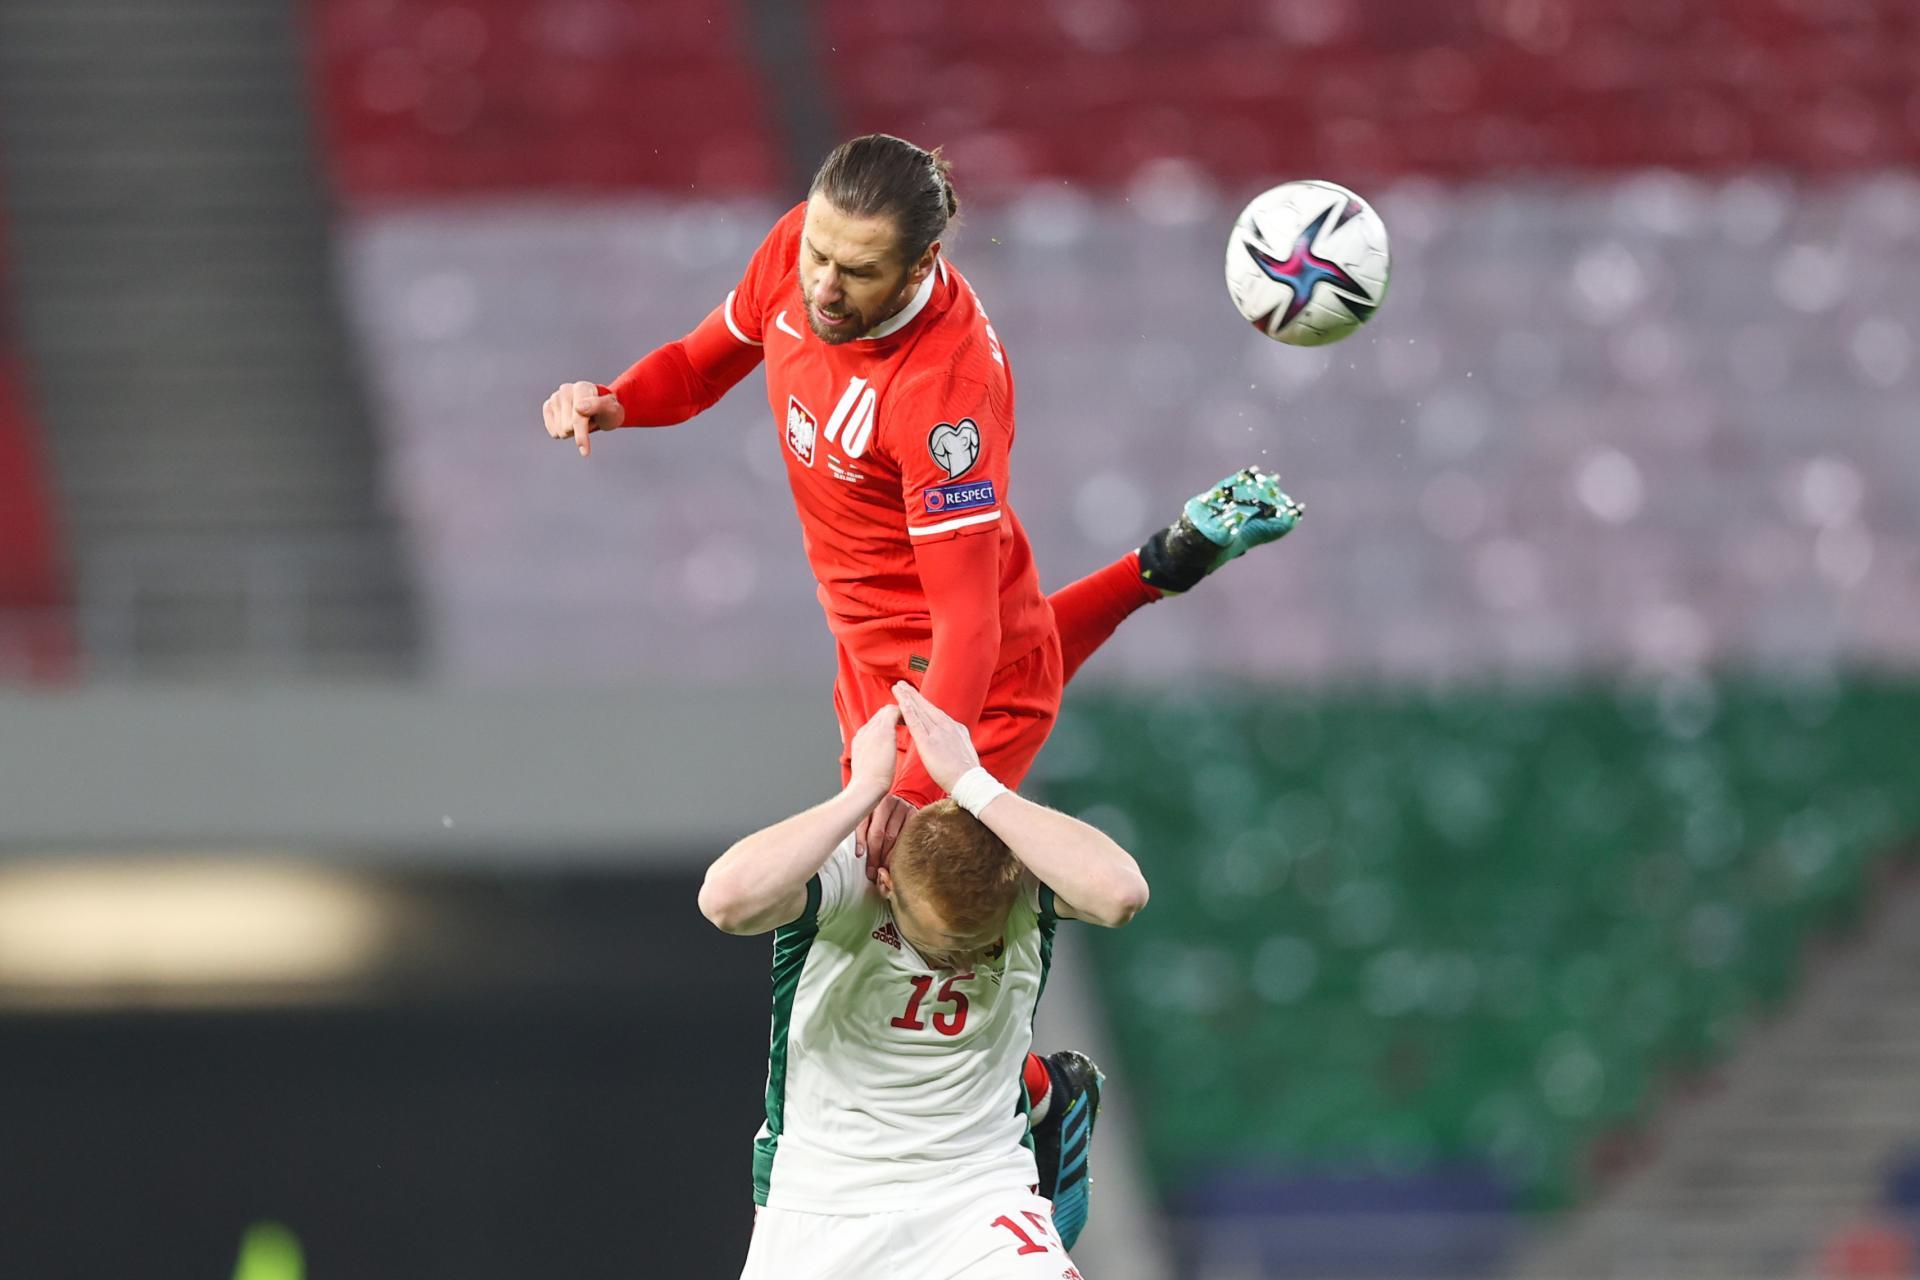 Węgry - Polska 3:3 (25.03.2021)